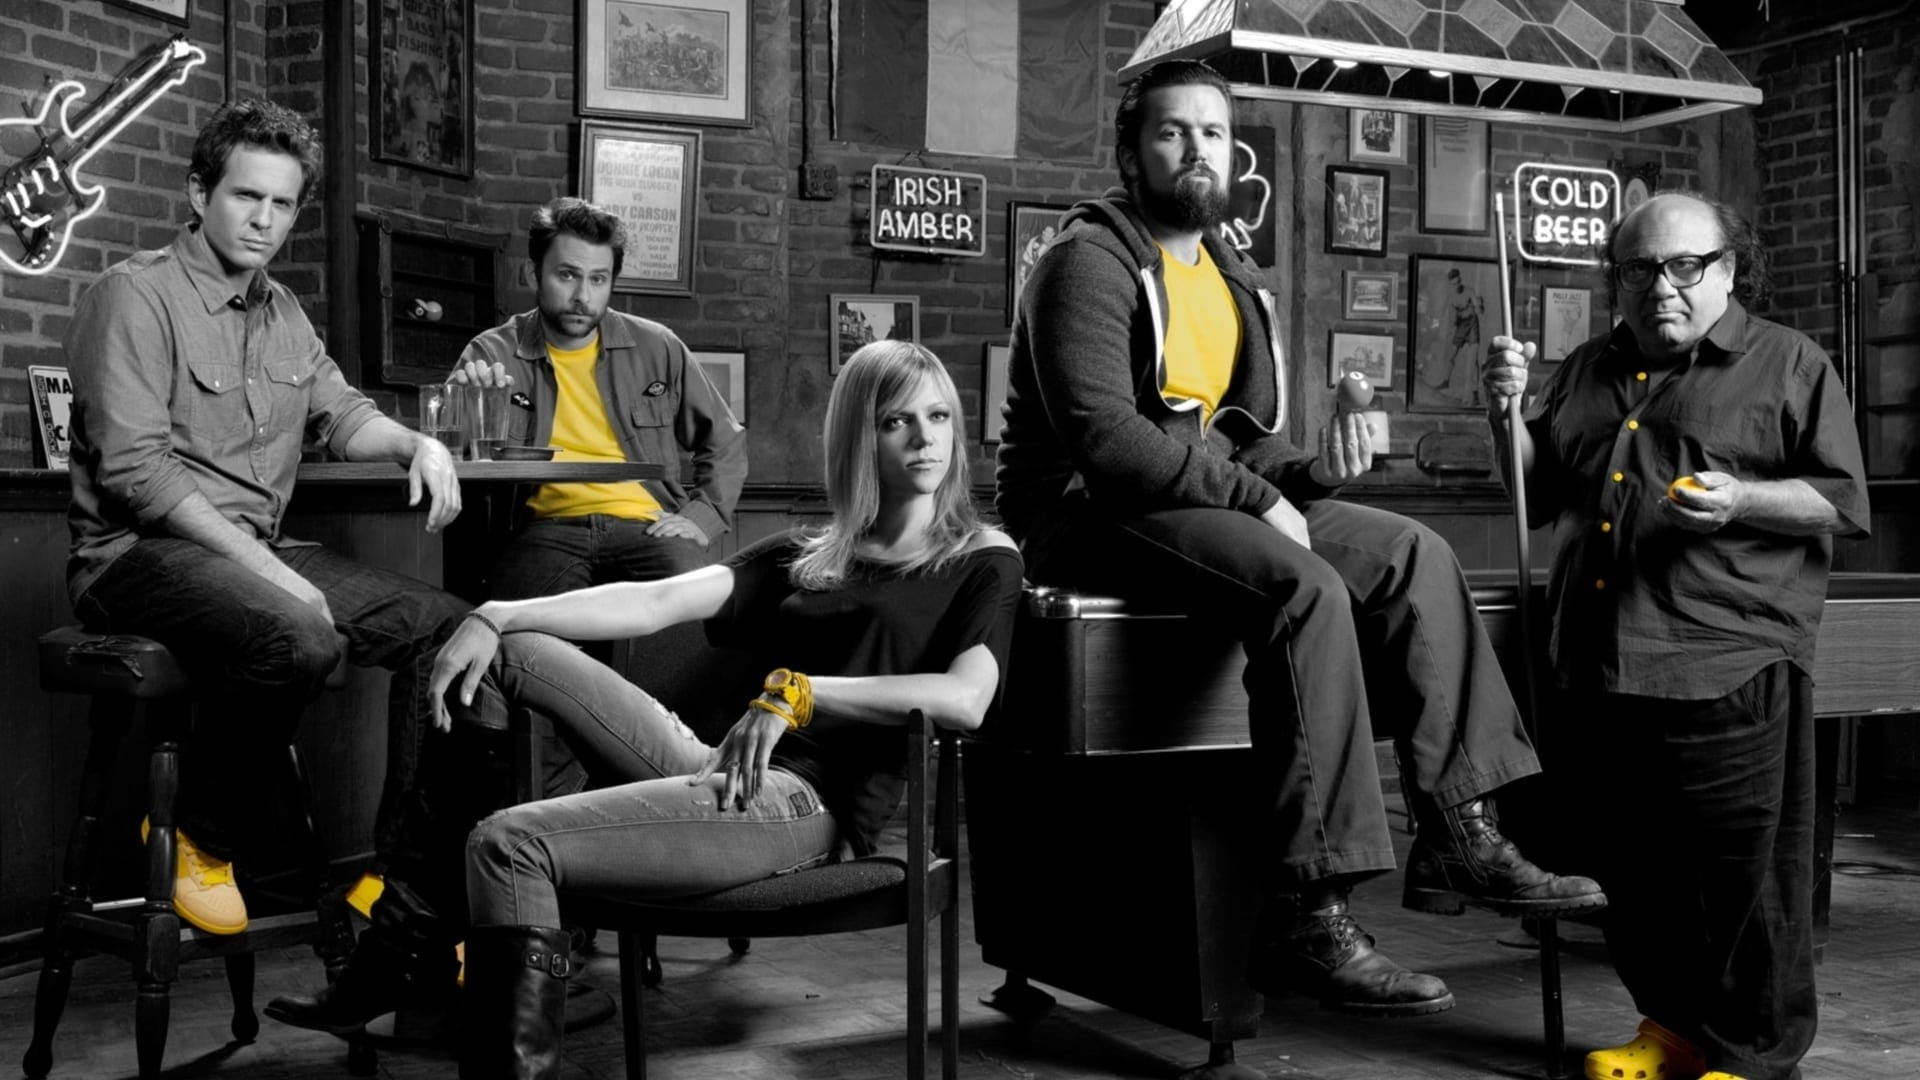 It's Always Sunny in Philadelphia - Season 0 Episode 19 : The Gang's Dating Profiles